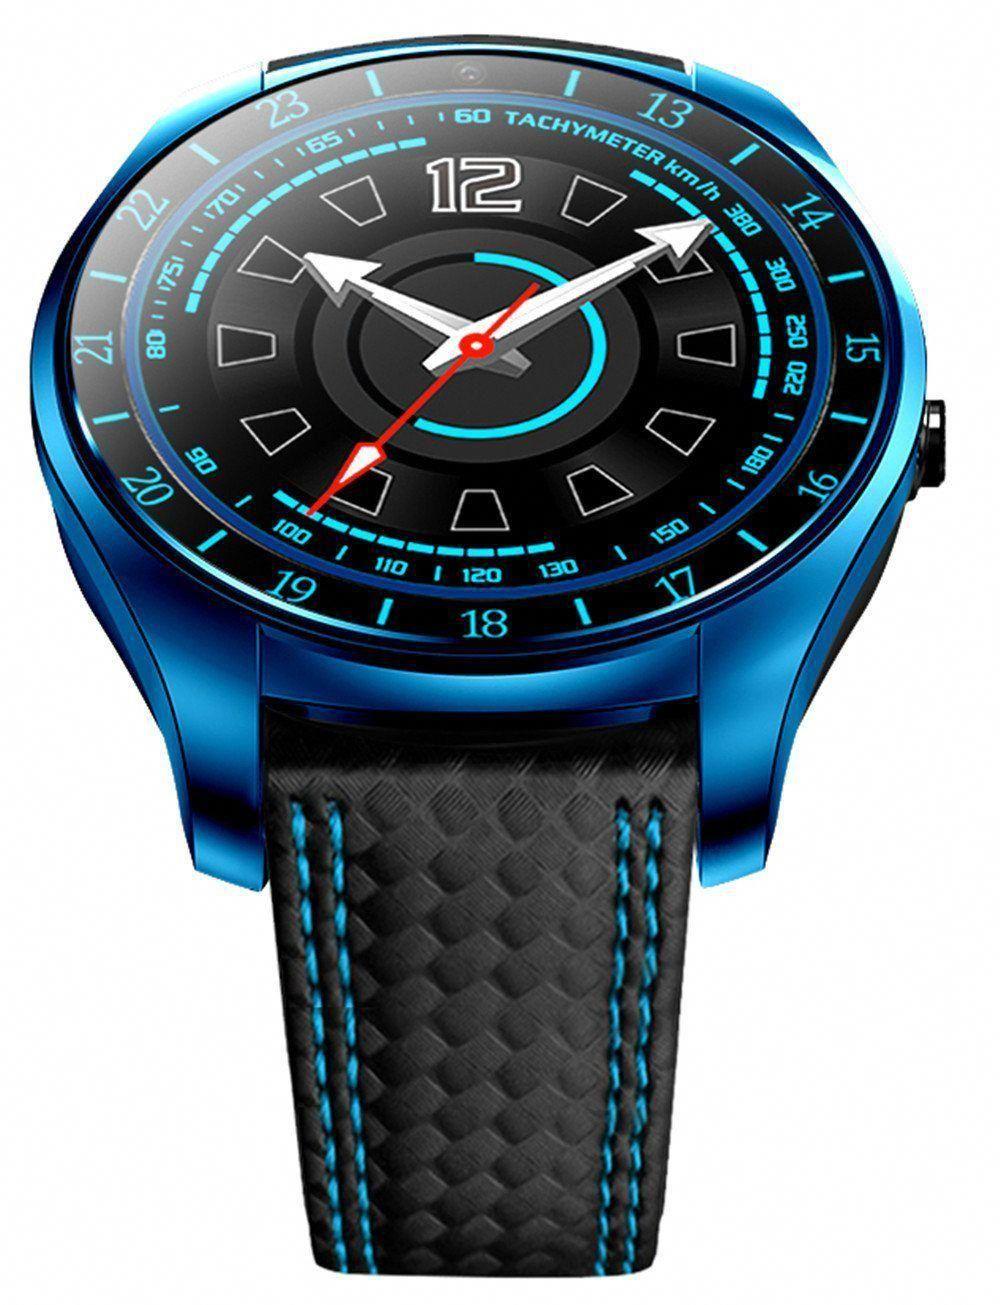 New Luxury Smart Watch with Camera Bluetooth Smartwatch